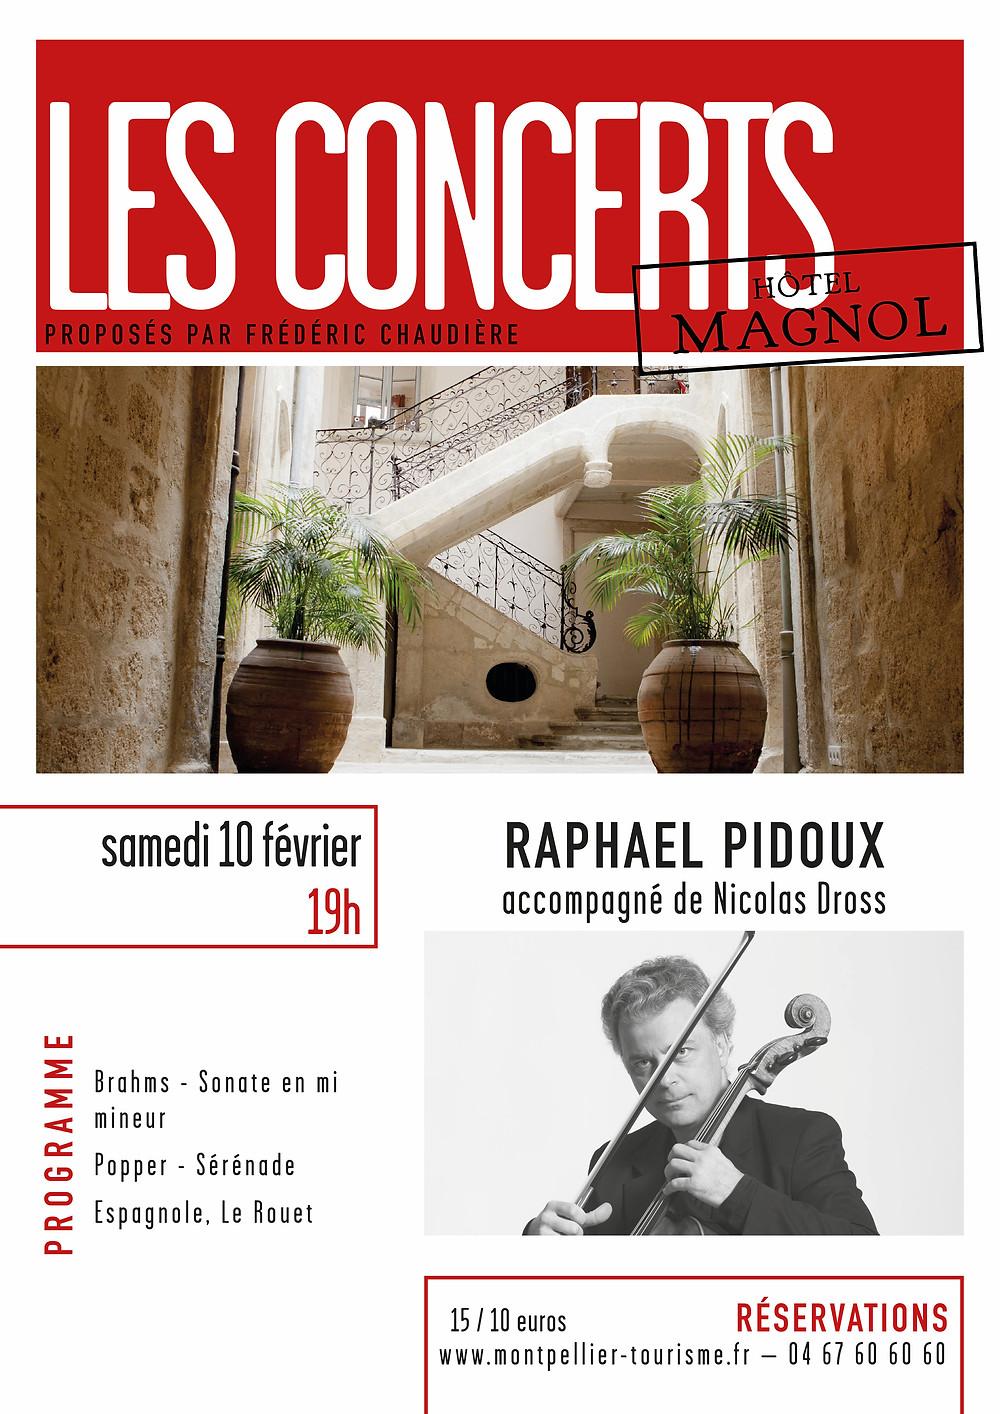 Concert Raphael Pidoux Hotel Magnol